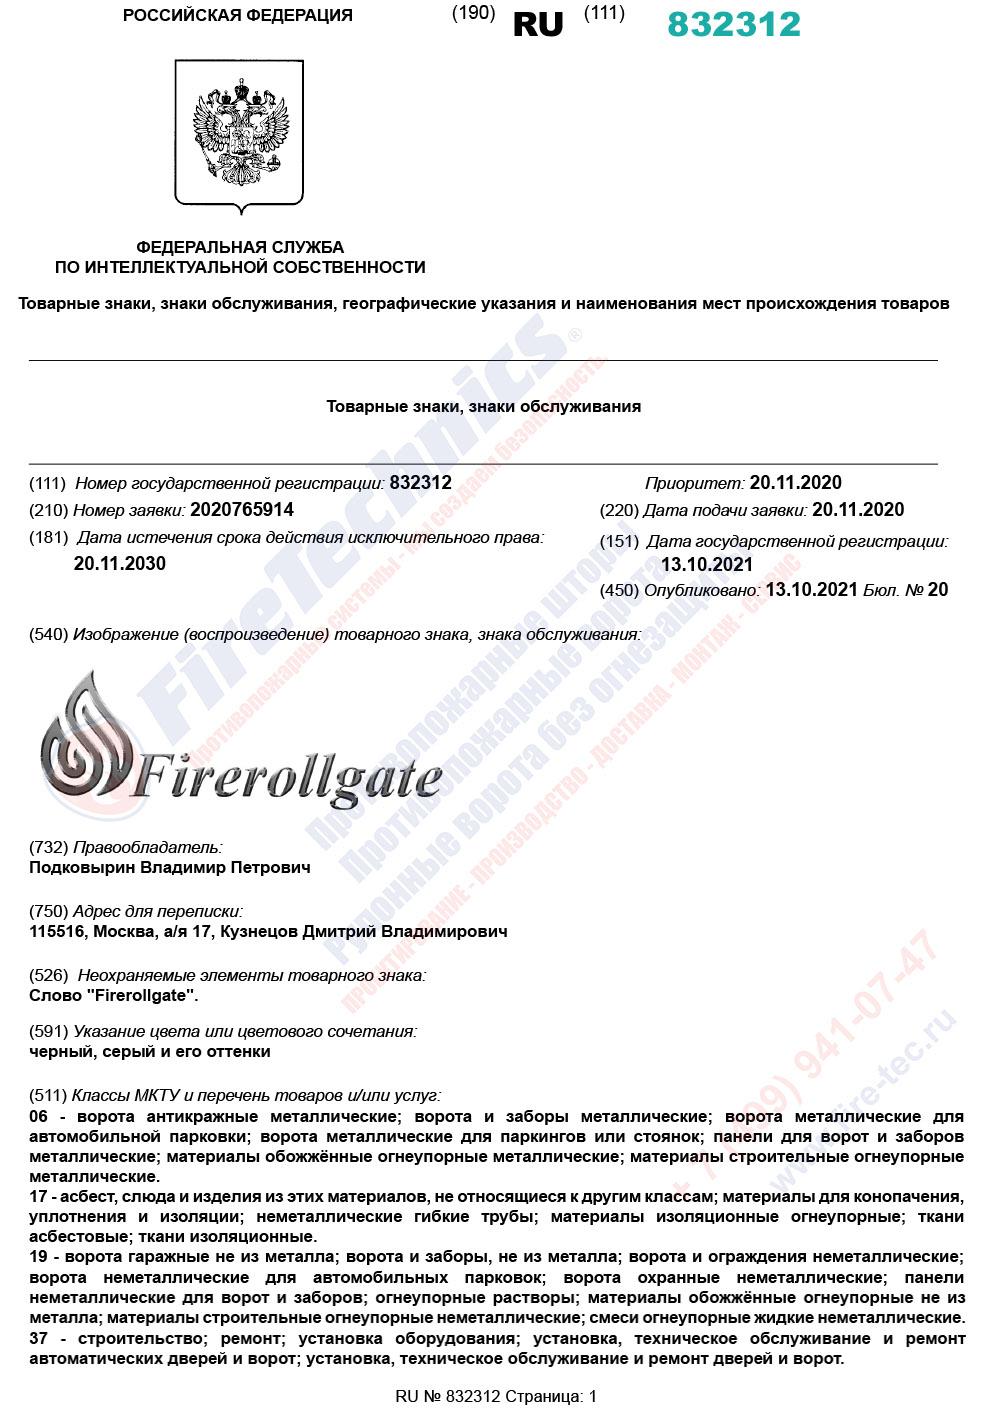 Товарный знак Firerollgate